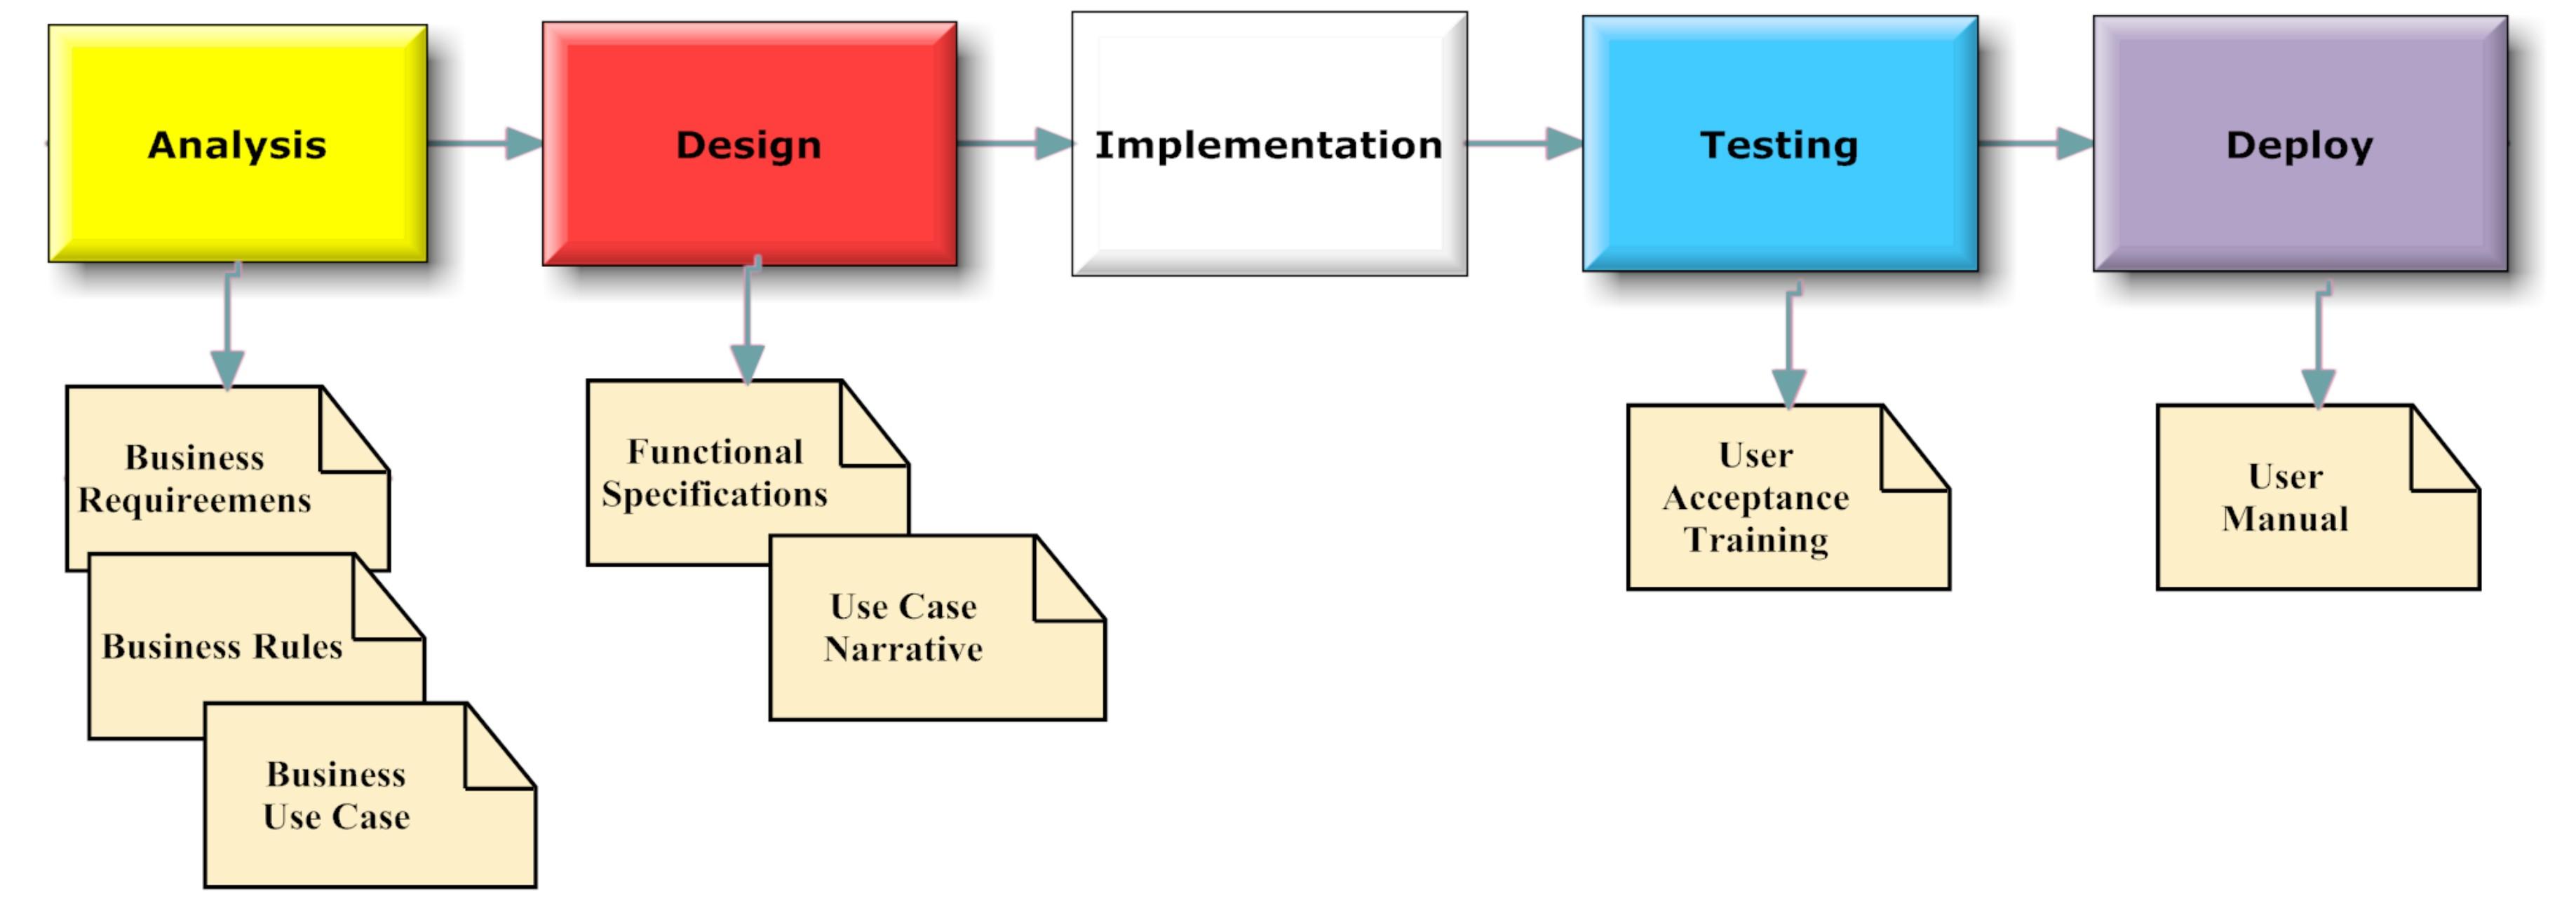 business process and documentation types business process analysis rh modernanalyst com Process Flow Diagram Examples Process Flow Diagram Symbols